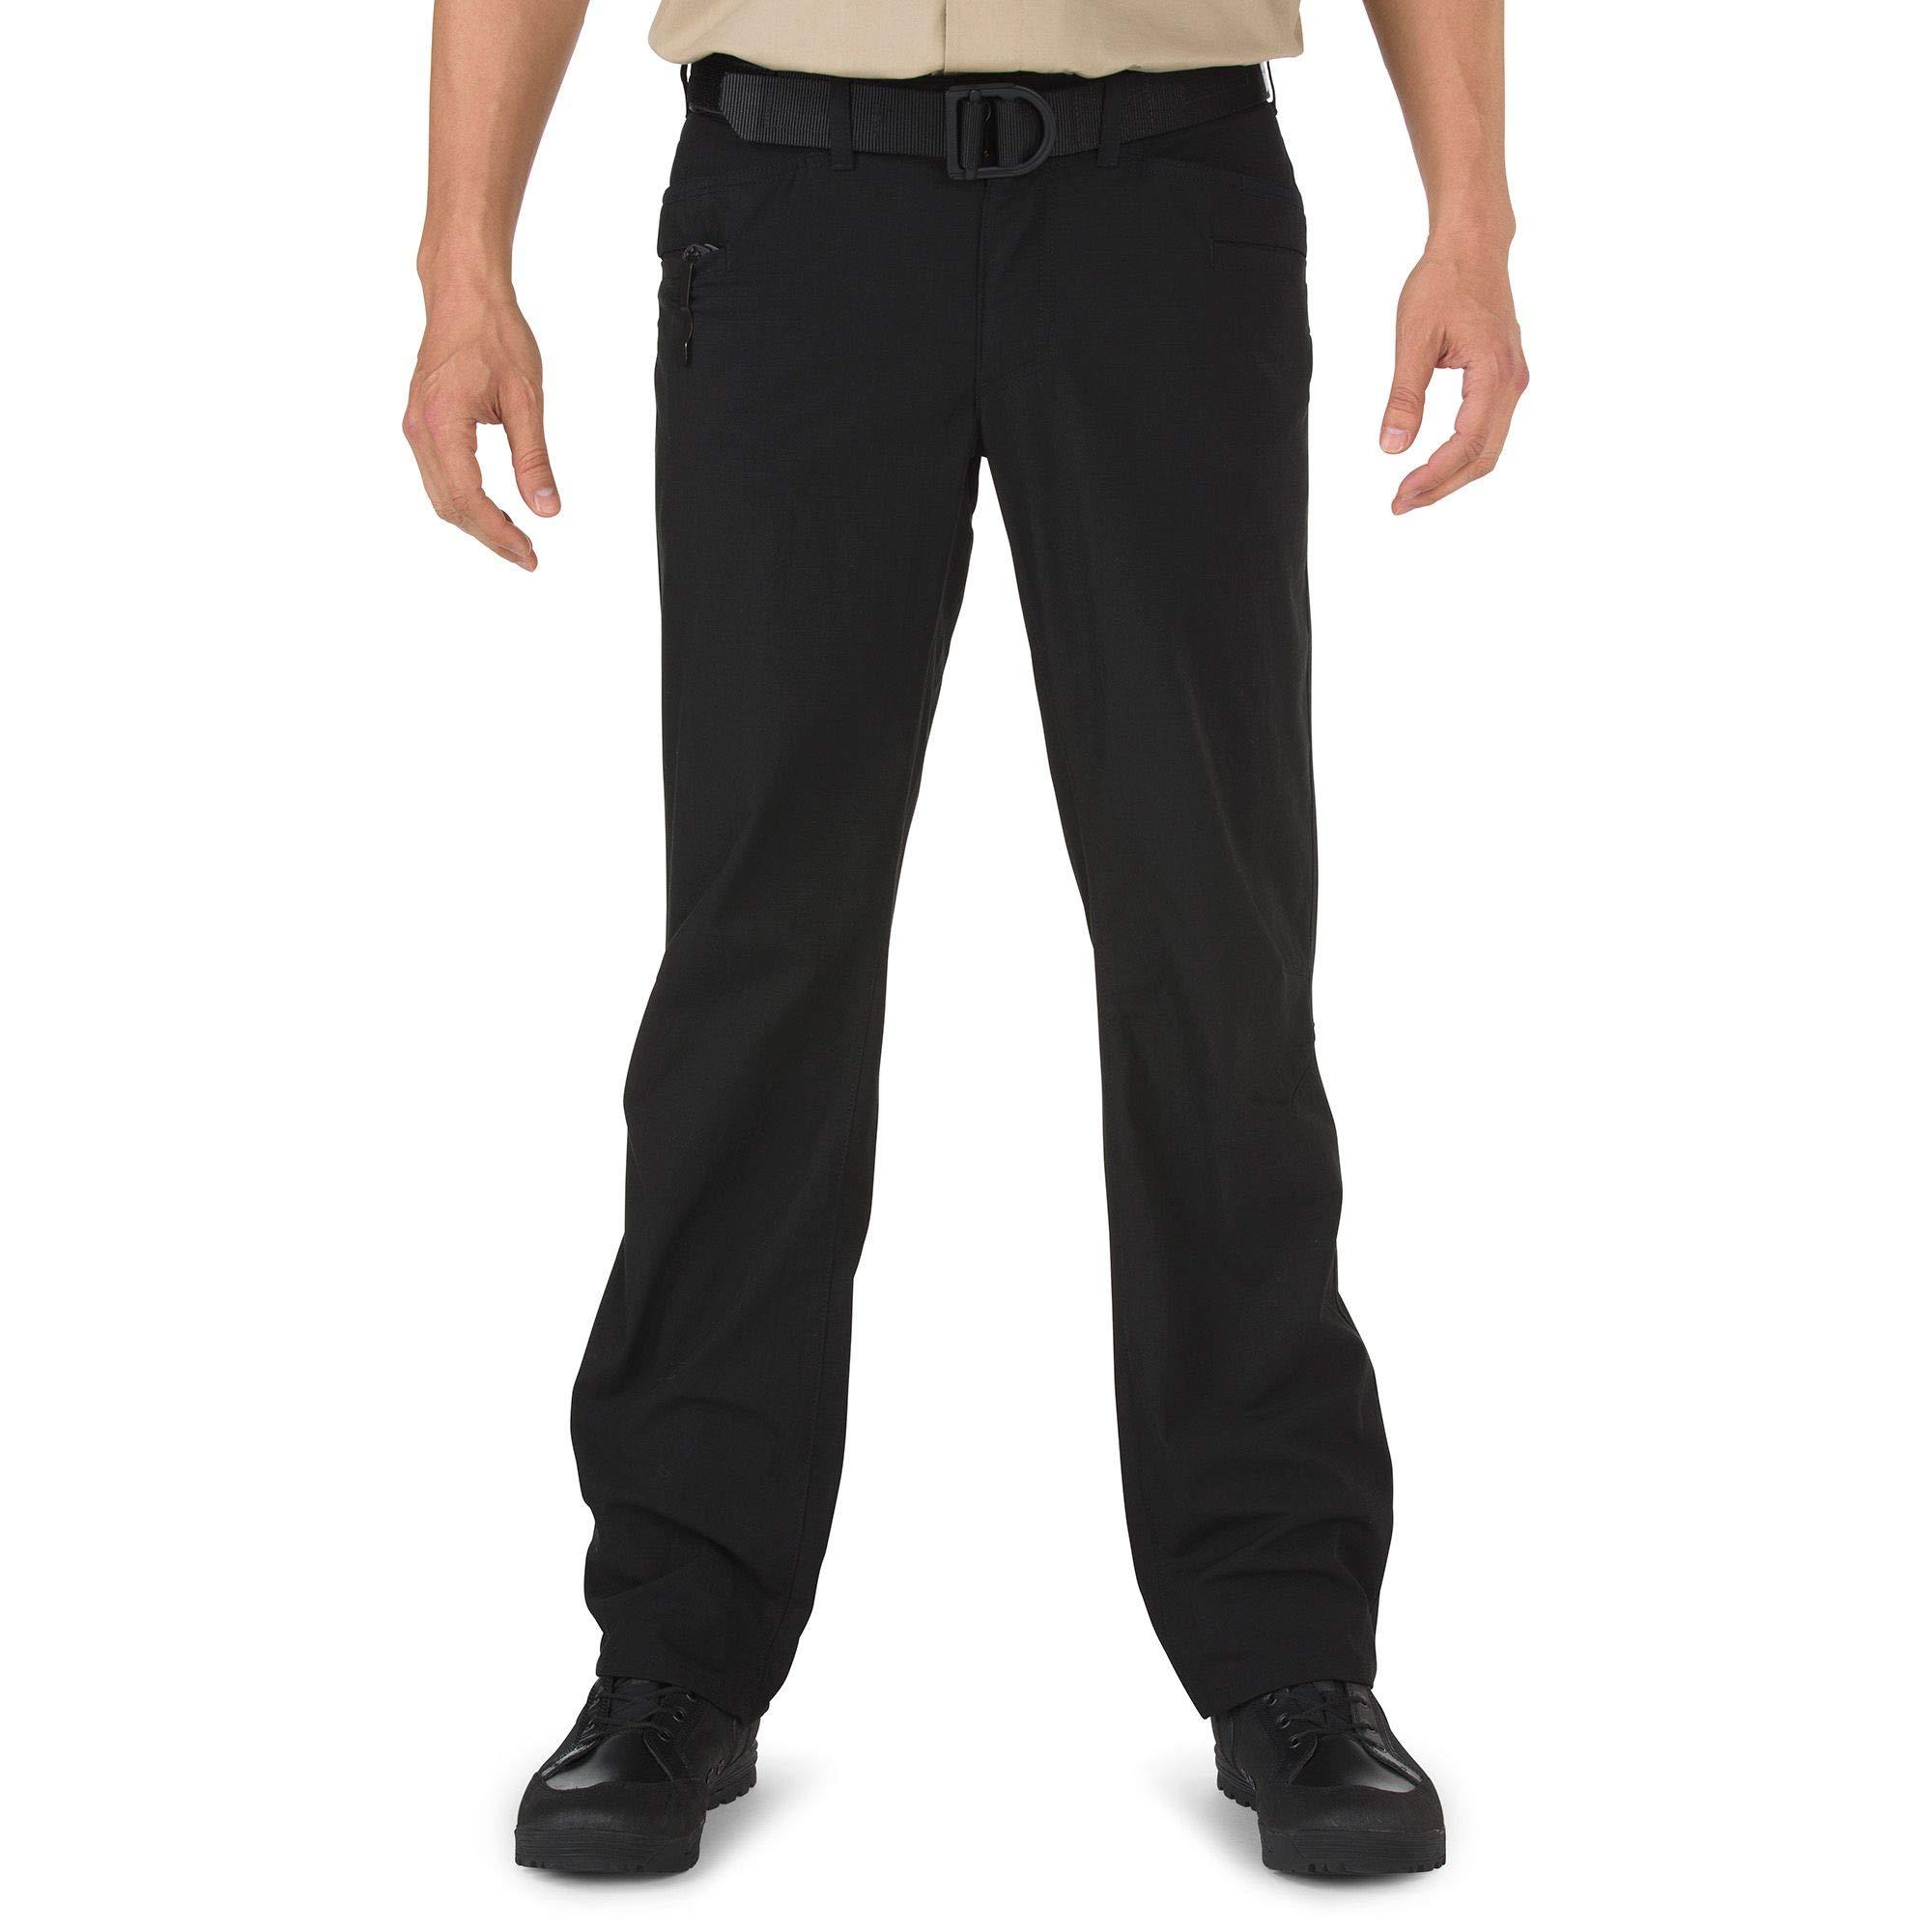 5.11 Tactical Ridgeline Pant,Black,36-30 by 5.11